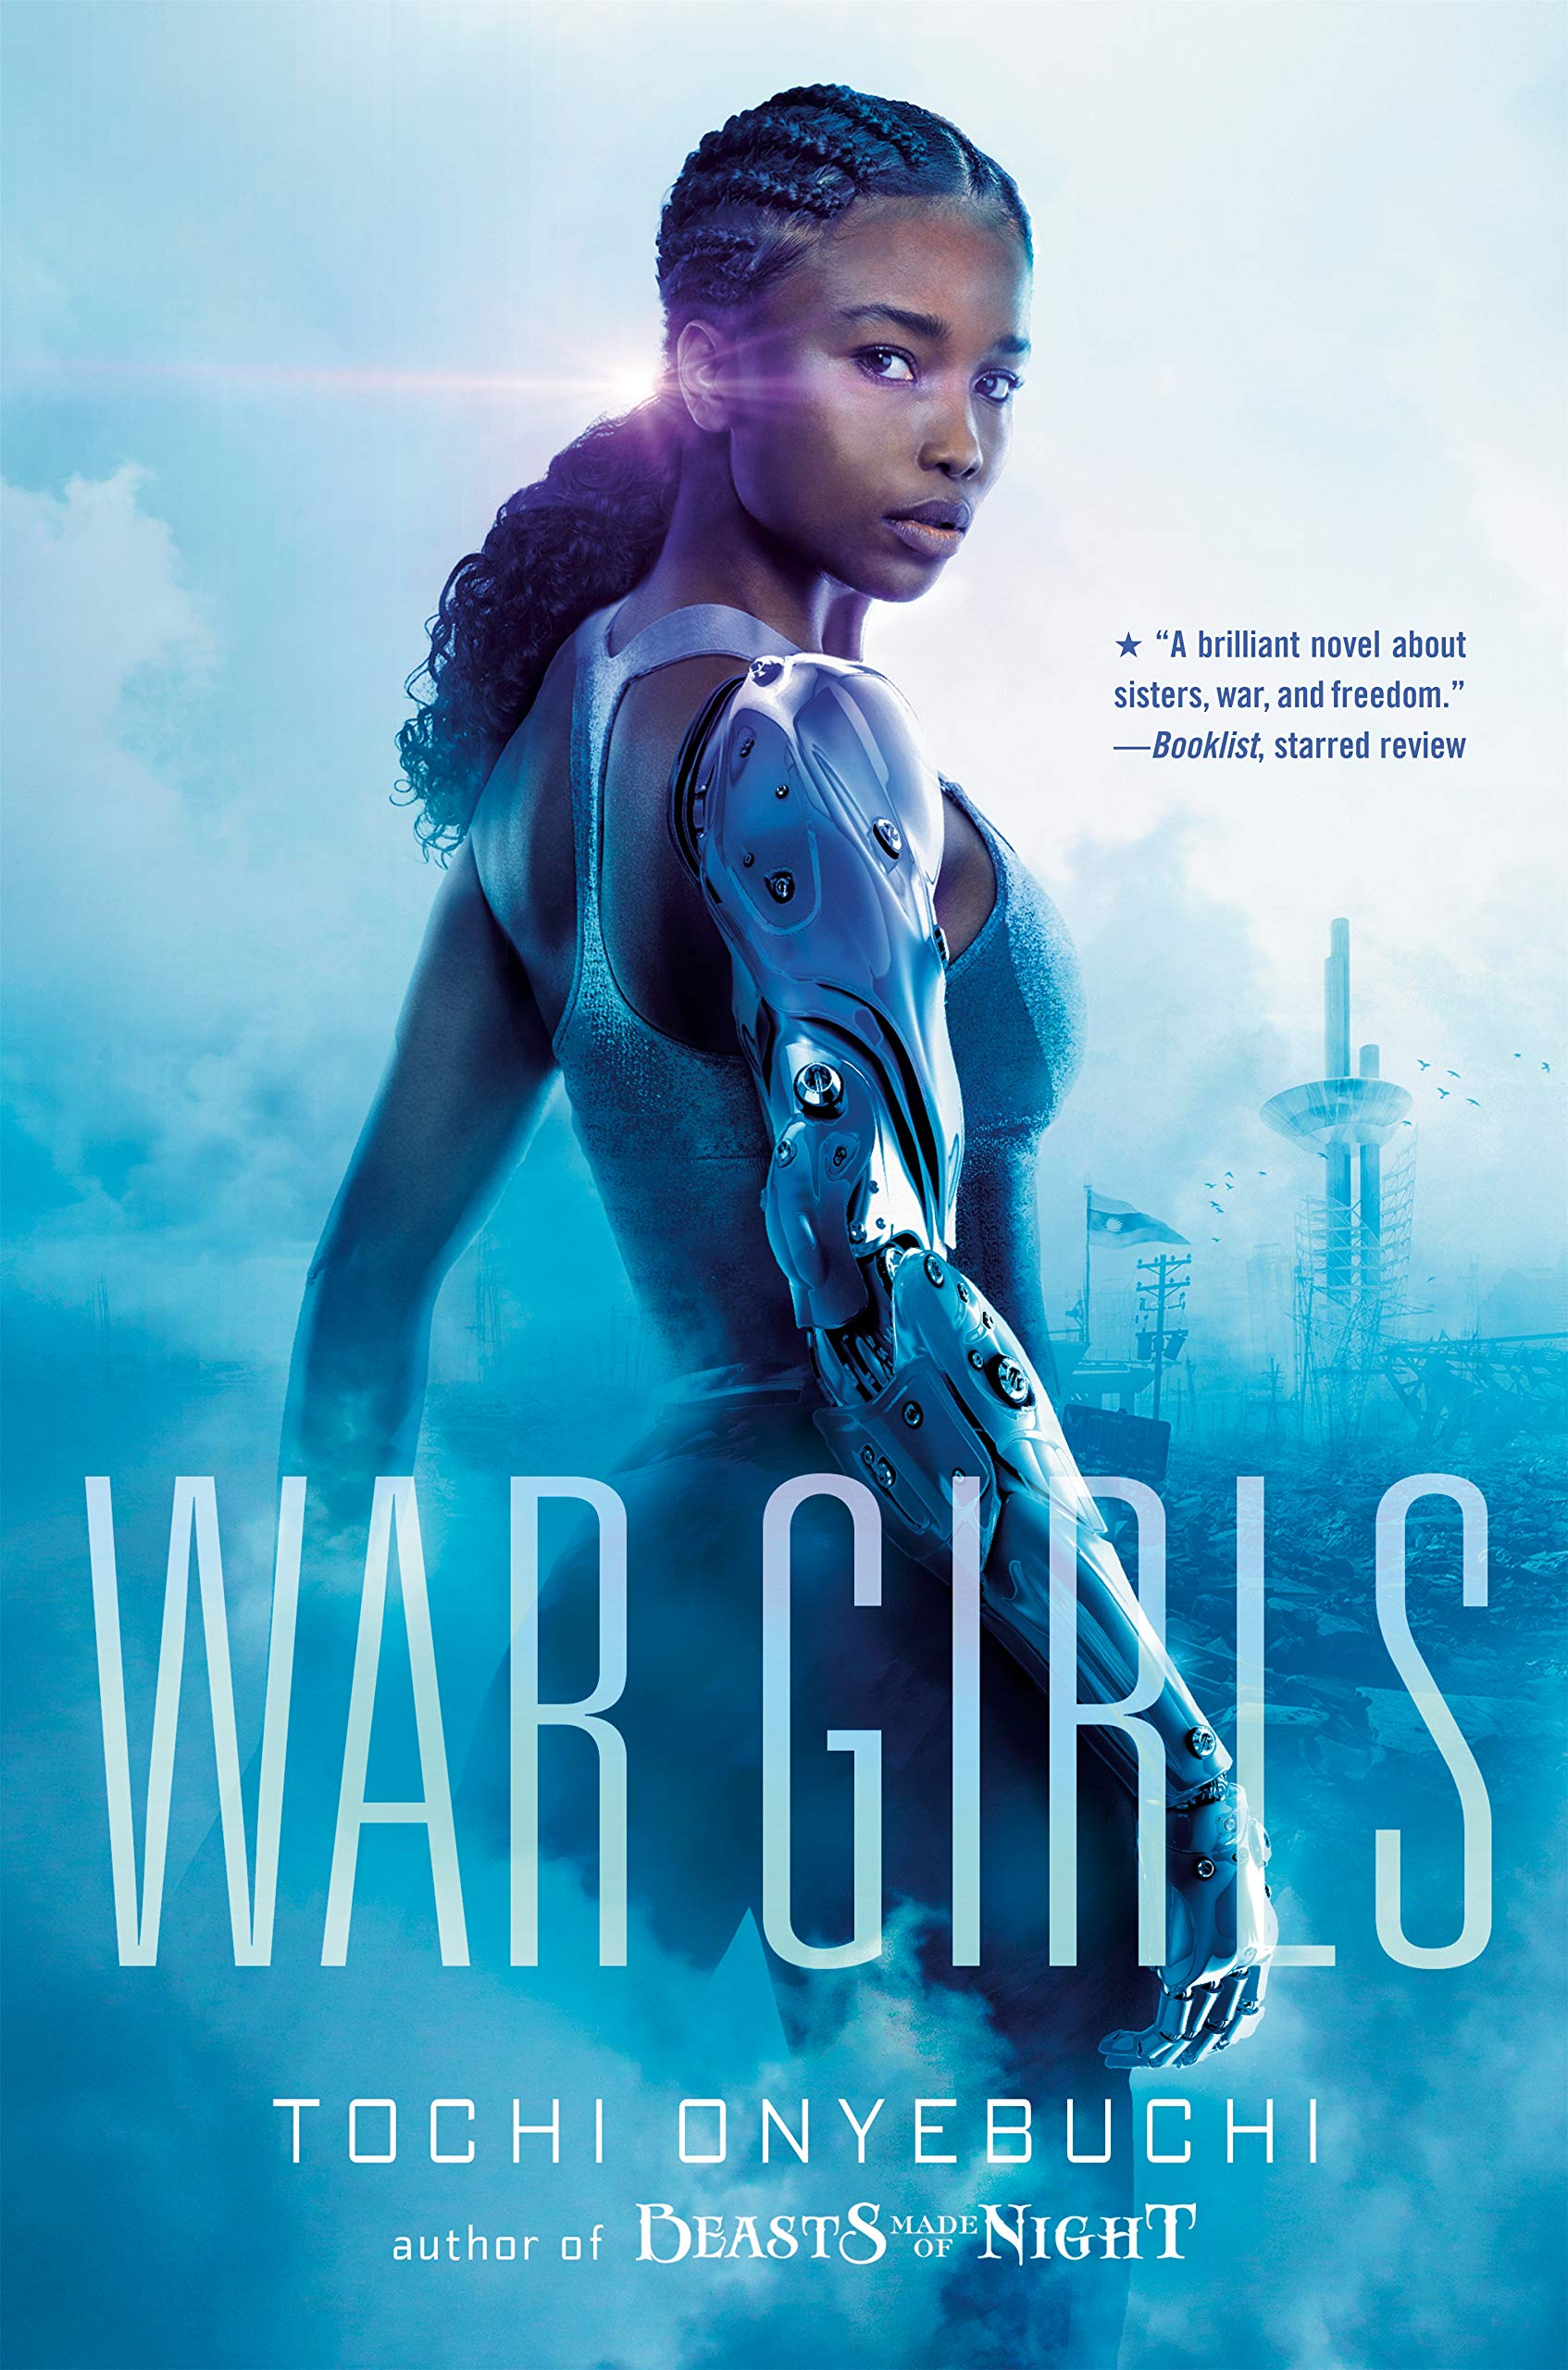 Amazon.com: War Girls (9780451481672): Onyebuchi, Tochi: Books